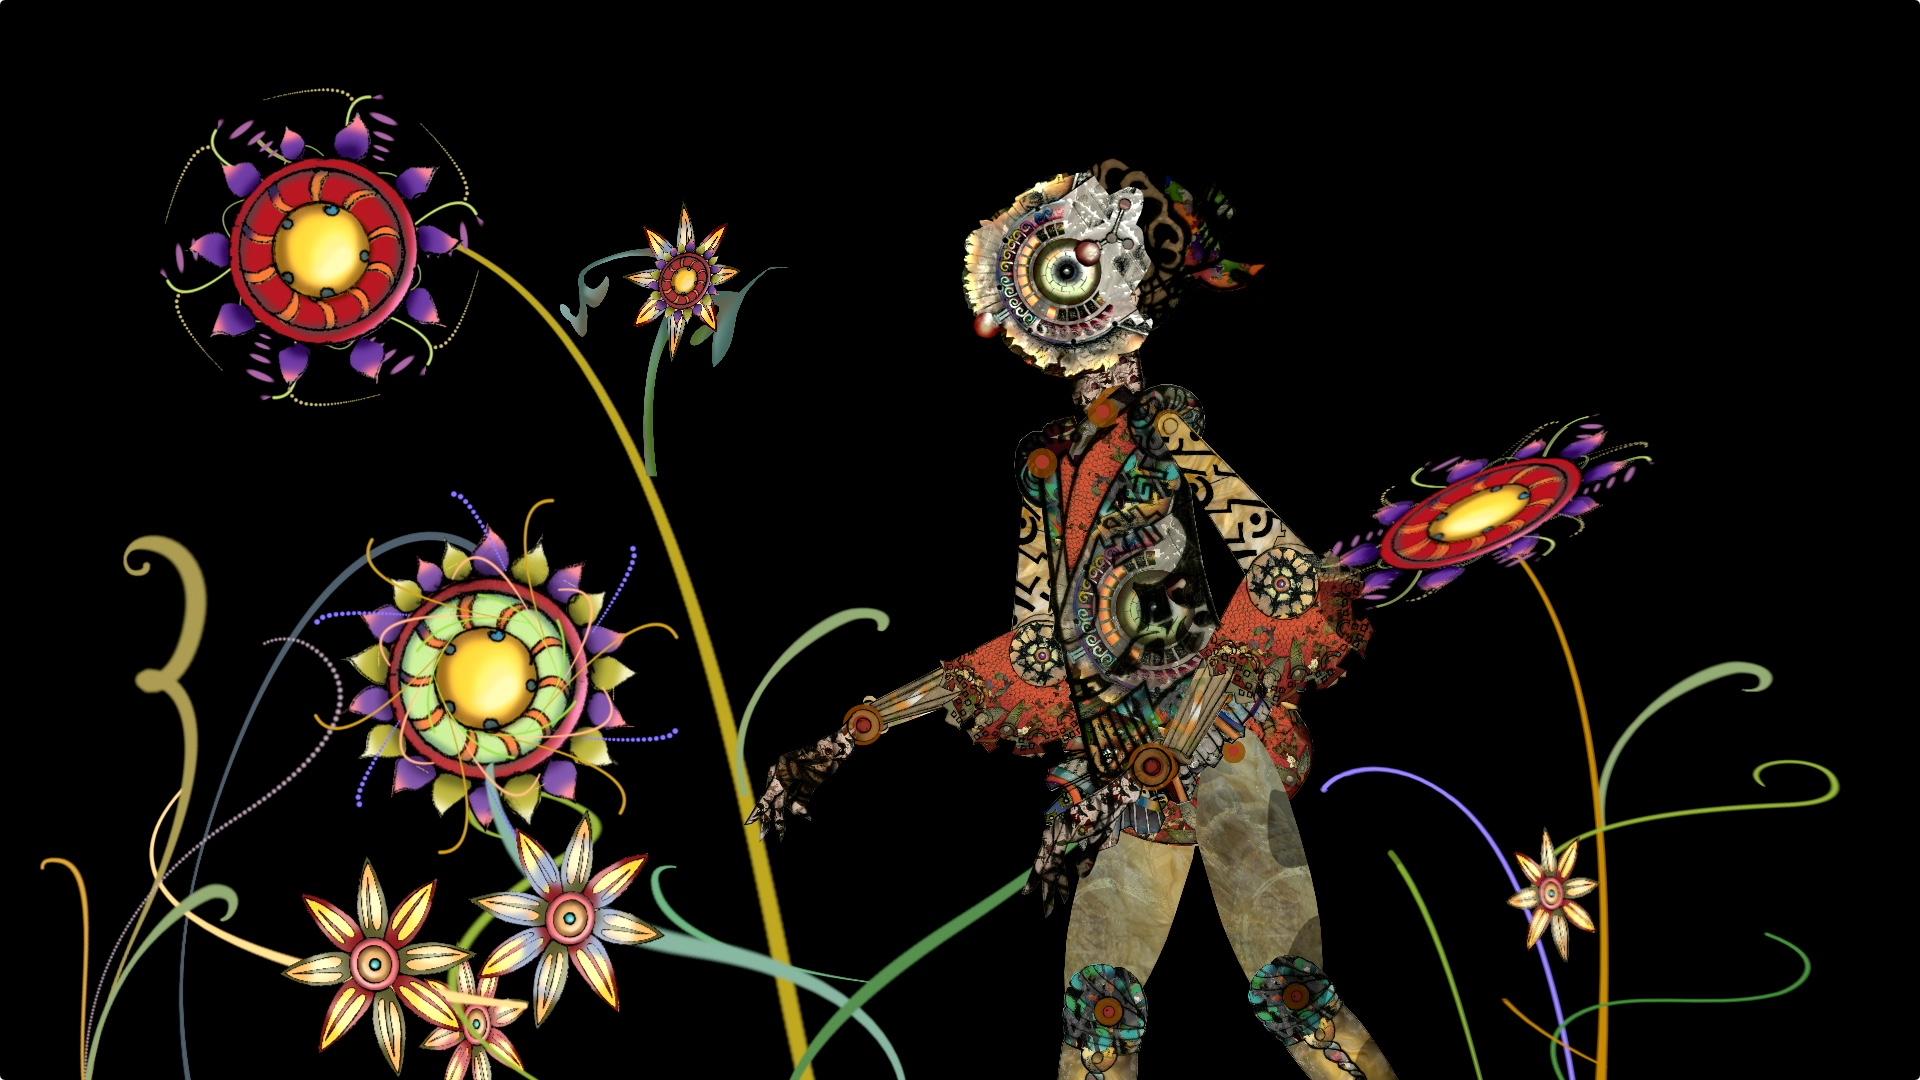 SEED : Artwork & Animation by Karen LaFleur & Music by Nancy Tucker